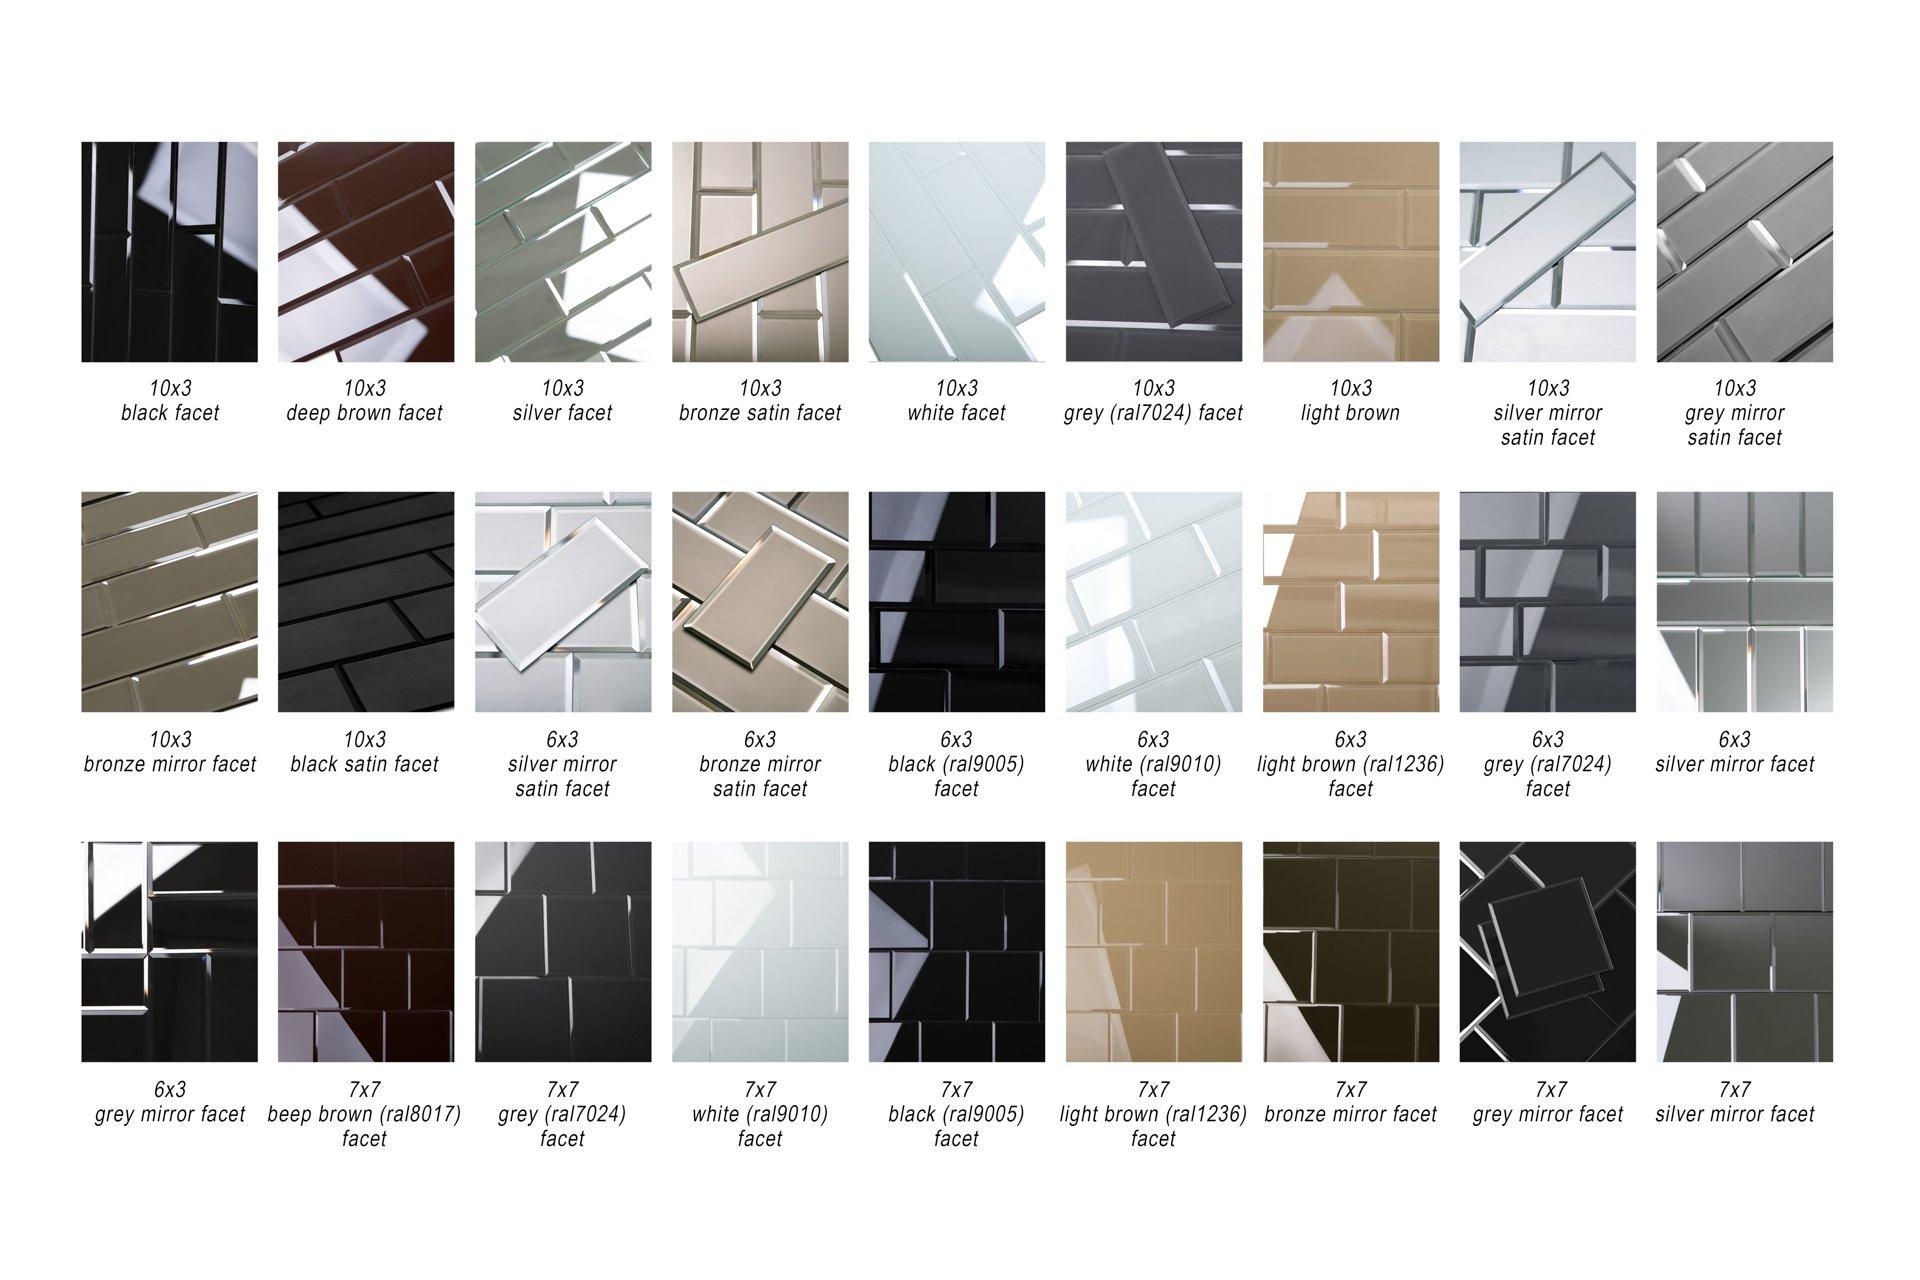 7'' x 7'' Subway Mirror Glass Tile with Beveled Edge for Kitchen Backsplash/Bathroom (40 Tiles Kit/Covers 12sq/ft)